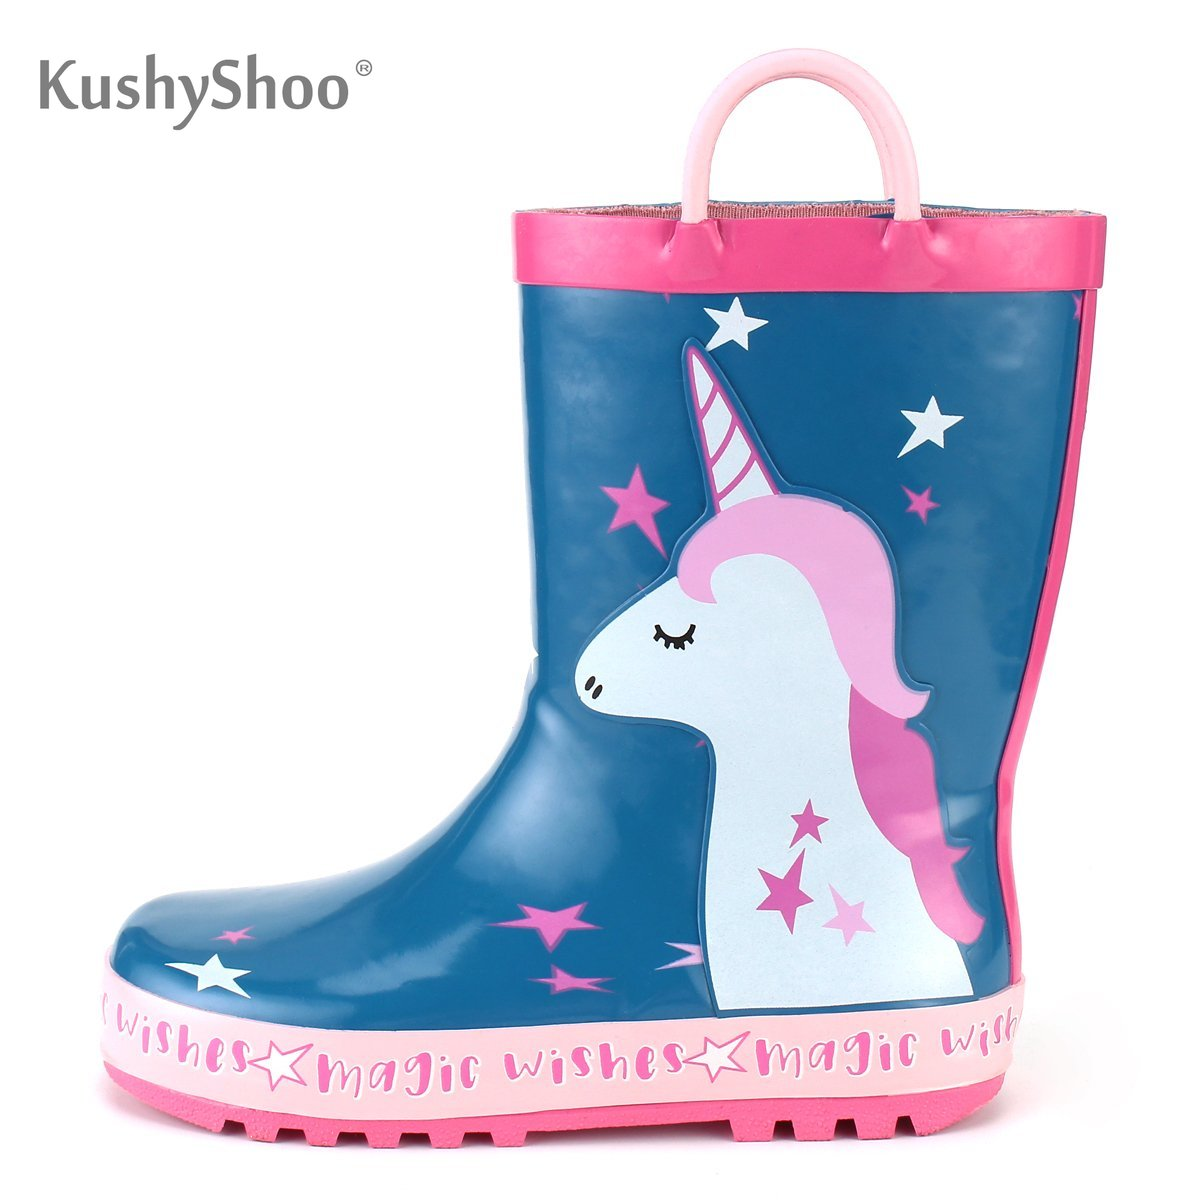 KushyShoo Girl Rain Boots Kids Cute Unicorn Printed With Handles Children's Rubber Boots Waterproof Outdoor Kalosze Dla Dzieci